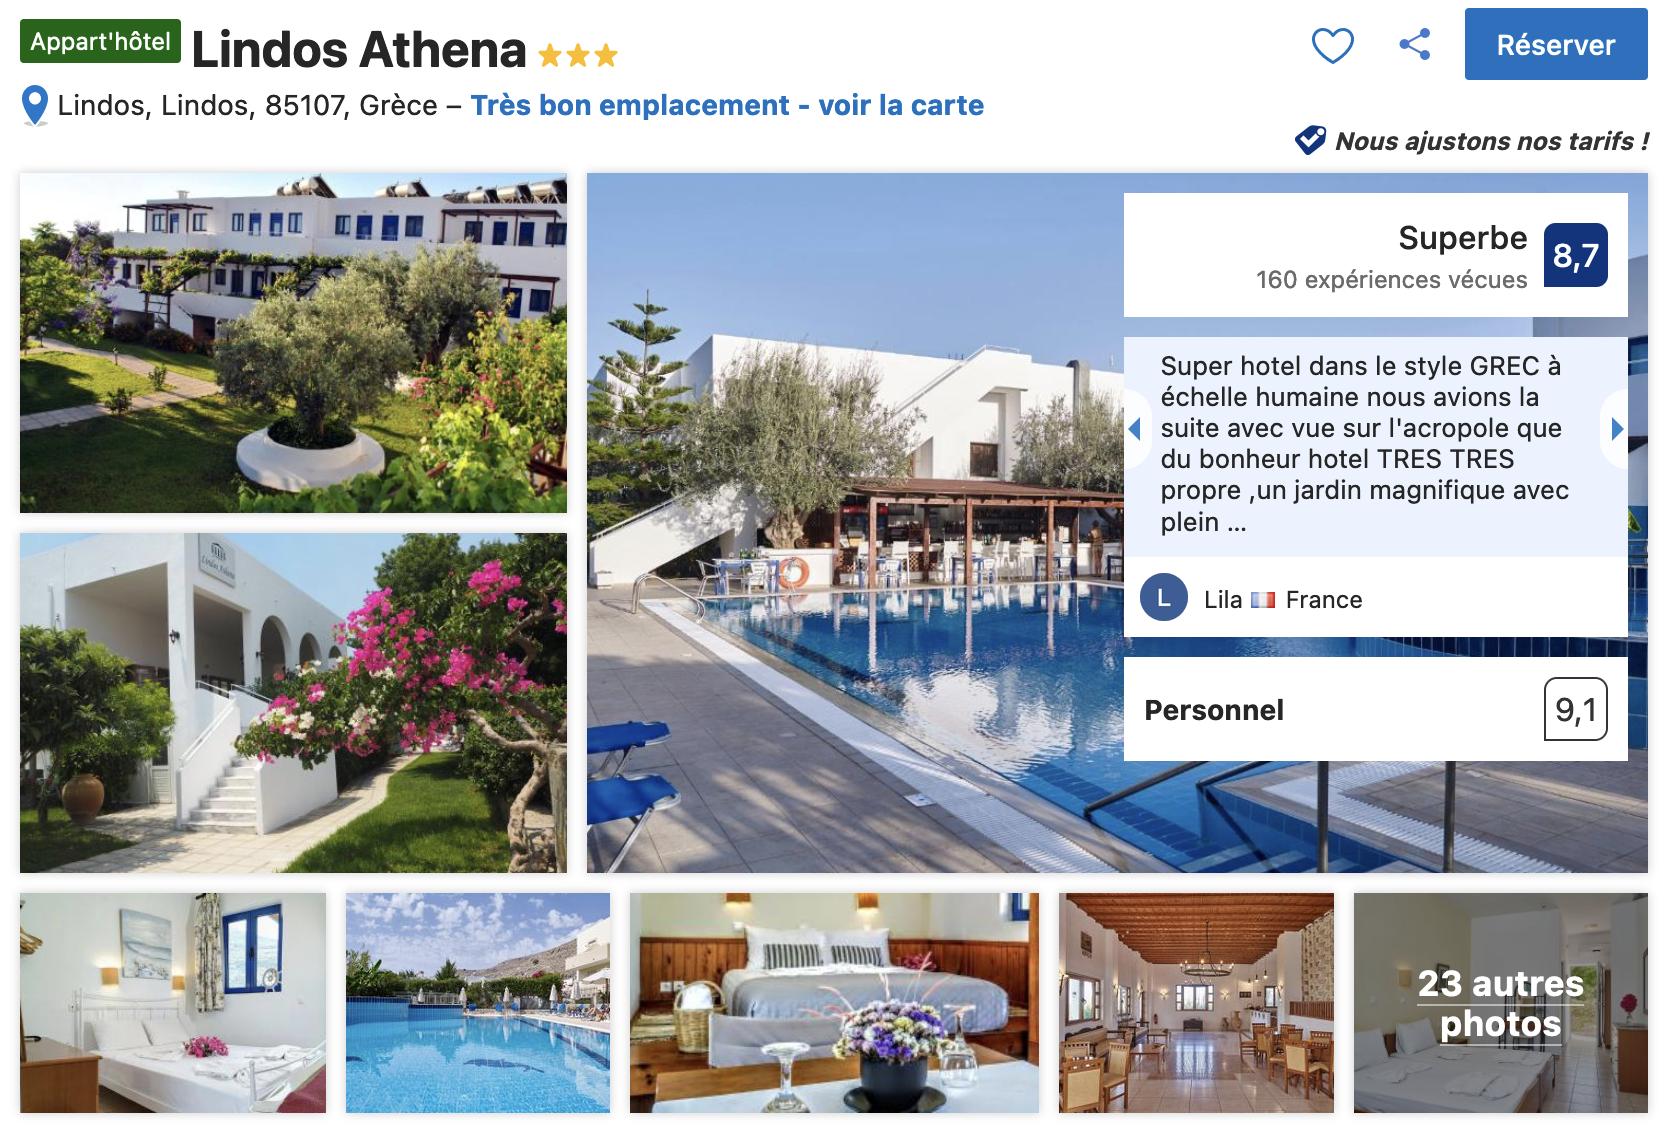 ile-rhodes-appart-hotel-proche-mer-lindos